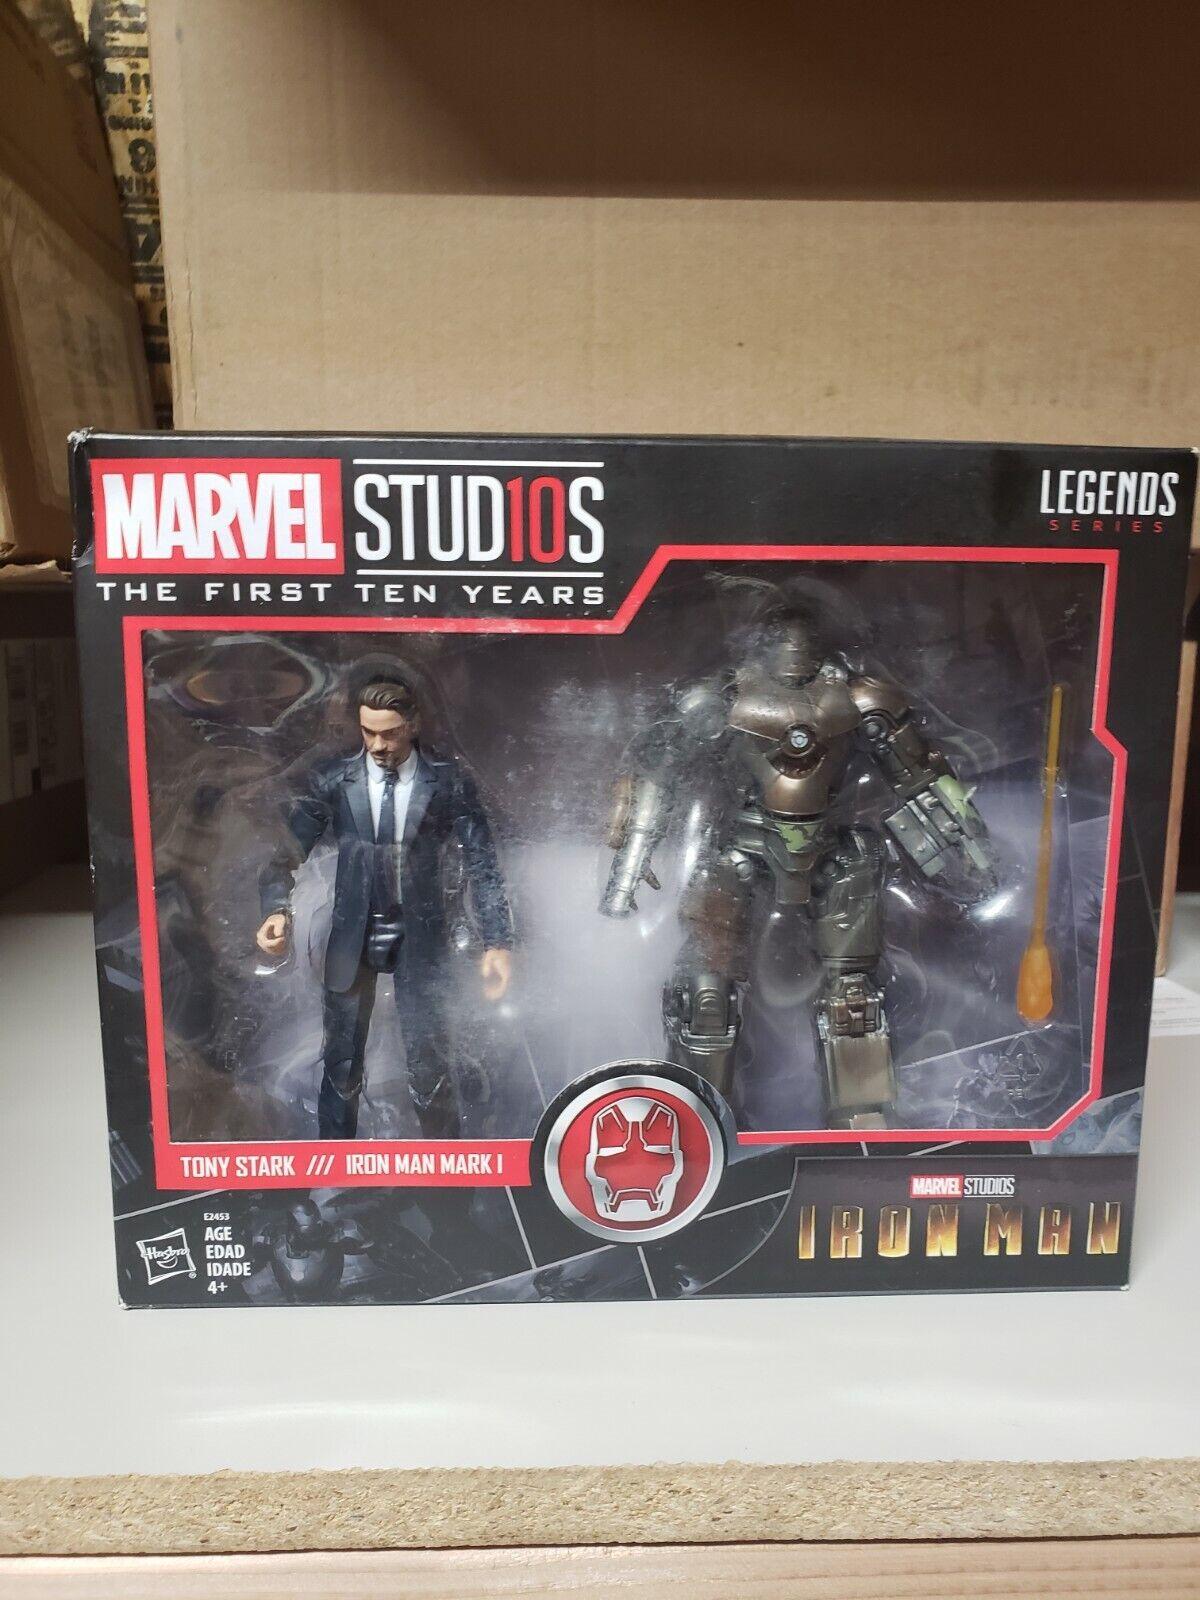 Marvel Legends Series Marvel Studios First 10 Years Tony Stark Iron Man Mark 1 on eBay thumbnail